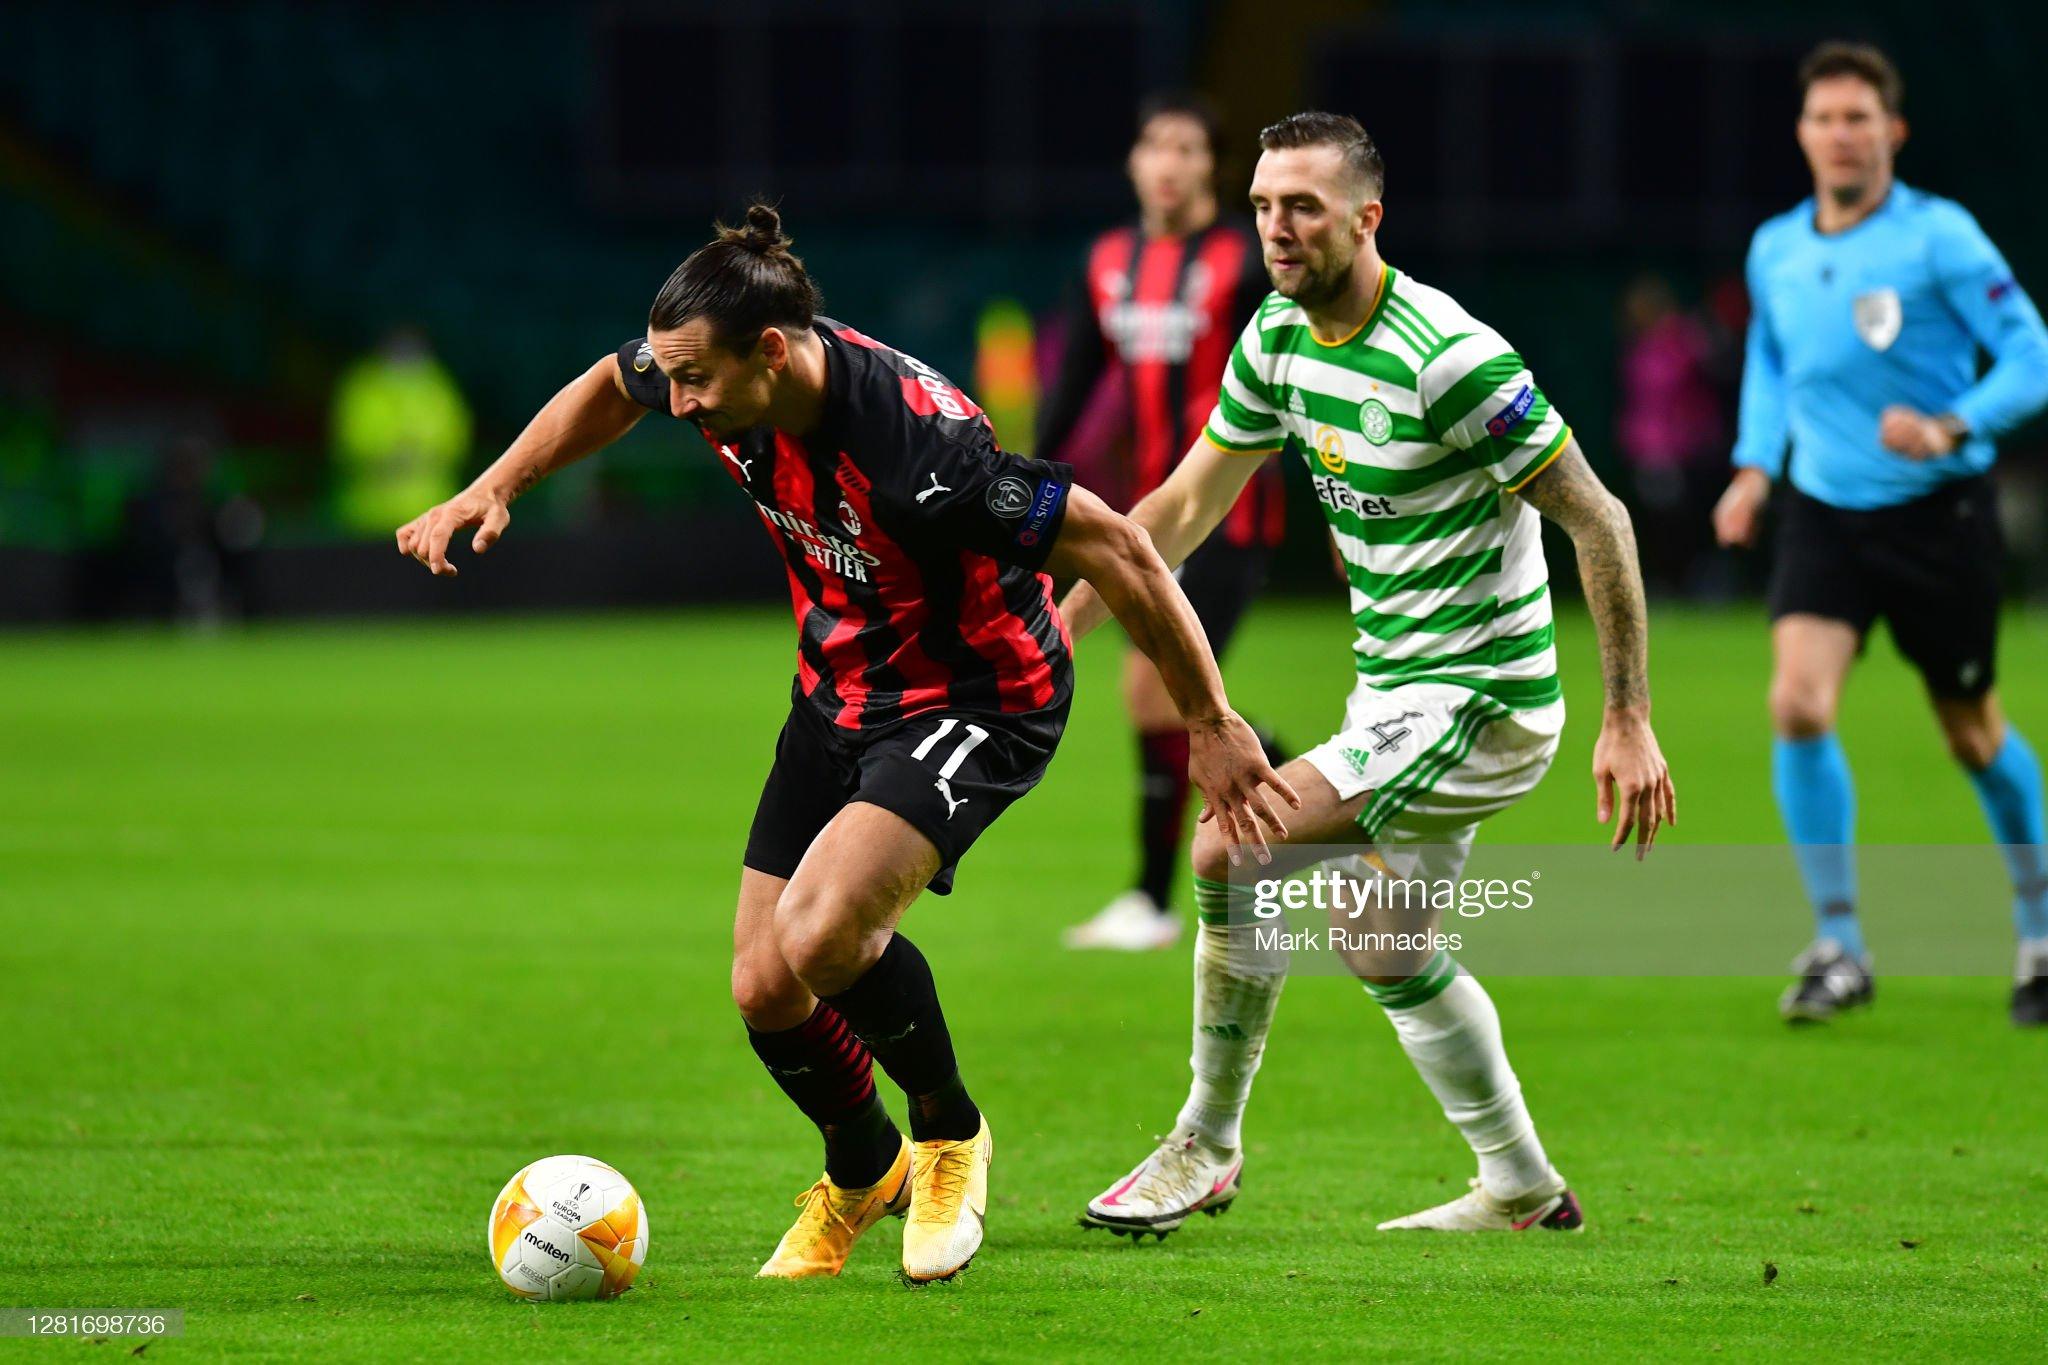 Milan vs Celtic Preview, prediction and odds